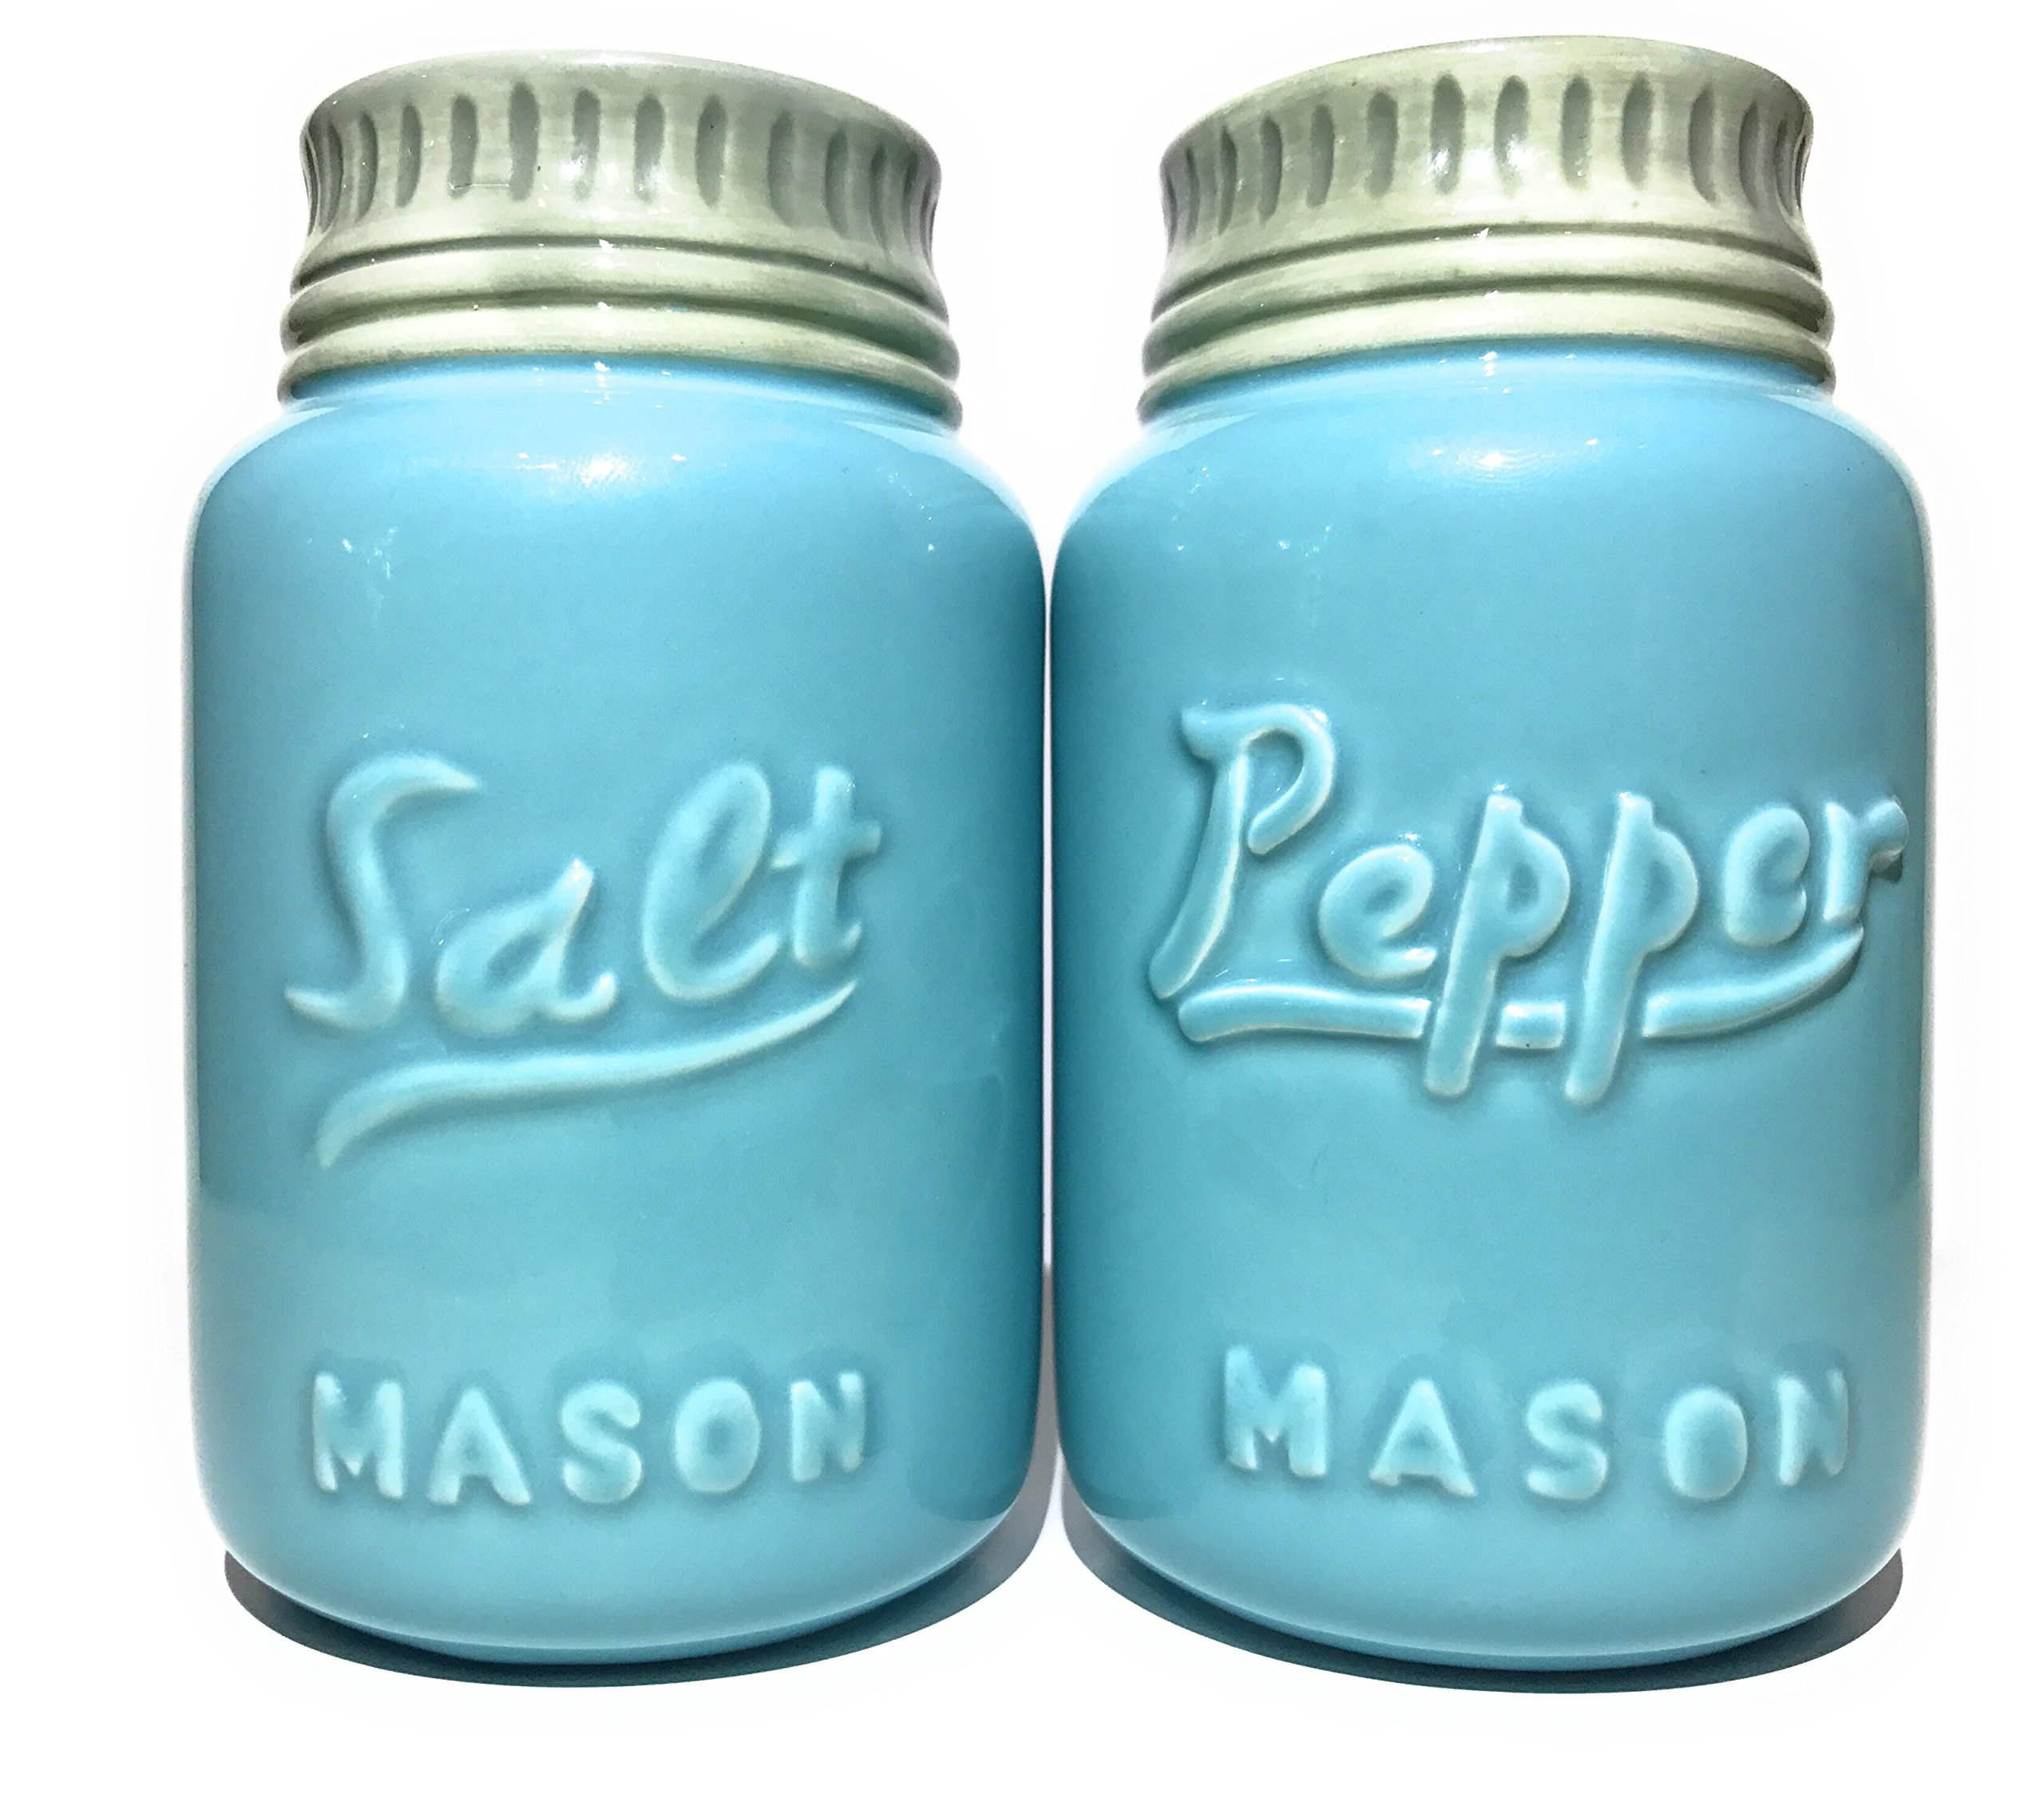 Ceramic Mason Jar Salt and Pepper Shaker Set - Vintage Style - Retro ...